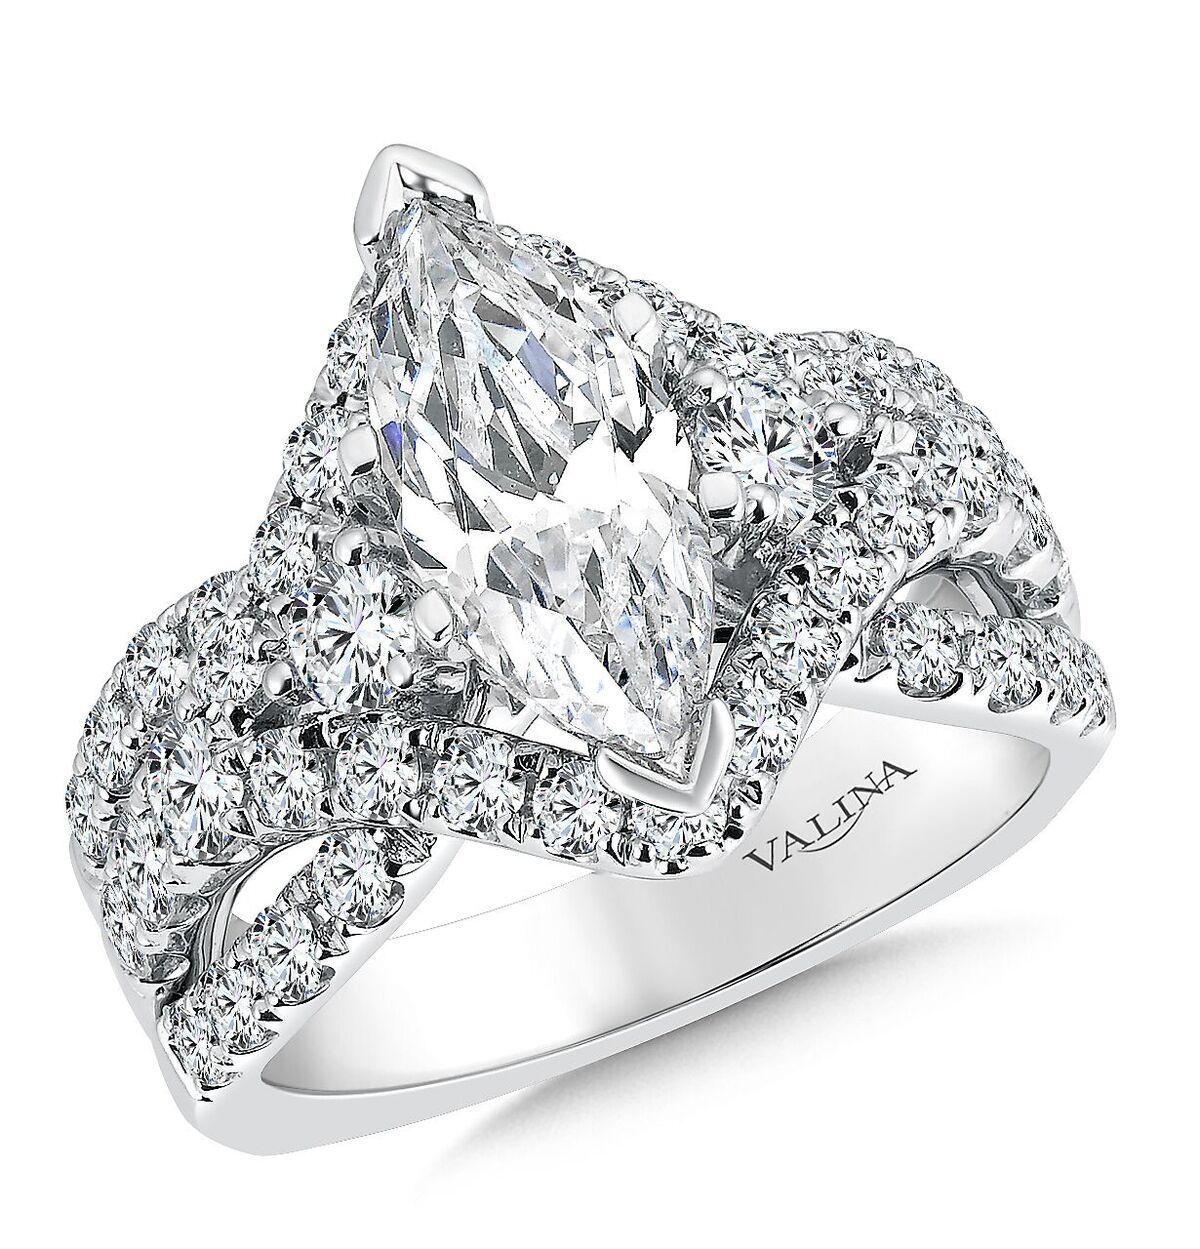 Marquise Diamond Engagement Ring Wholesale Engagement Rings 1 1, Shira Diamonds